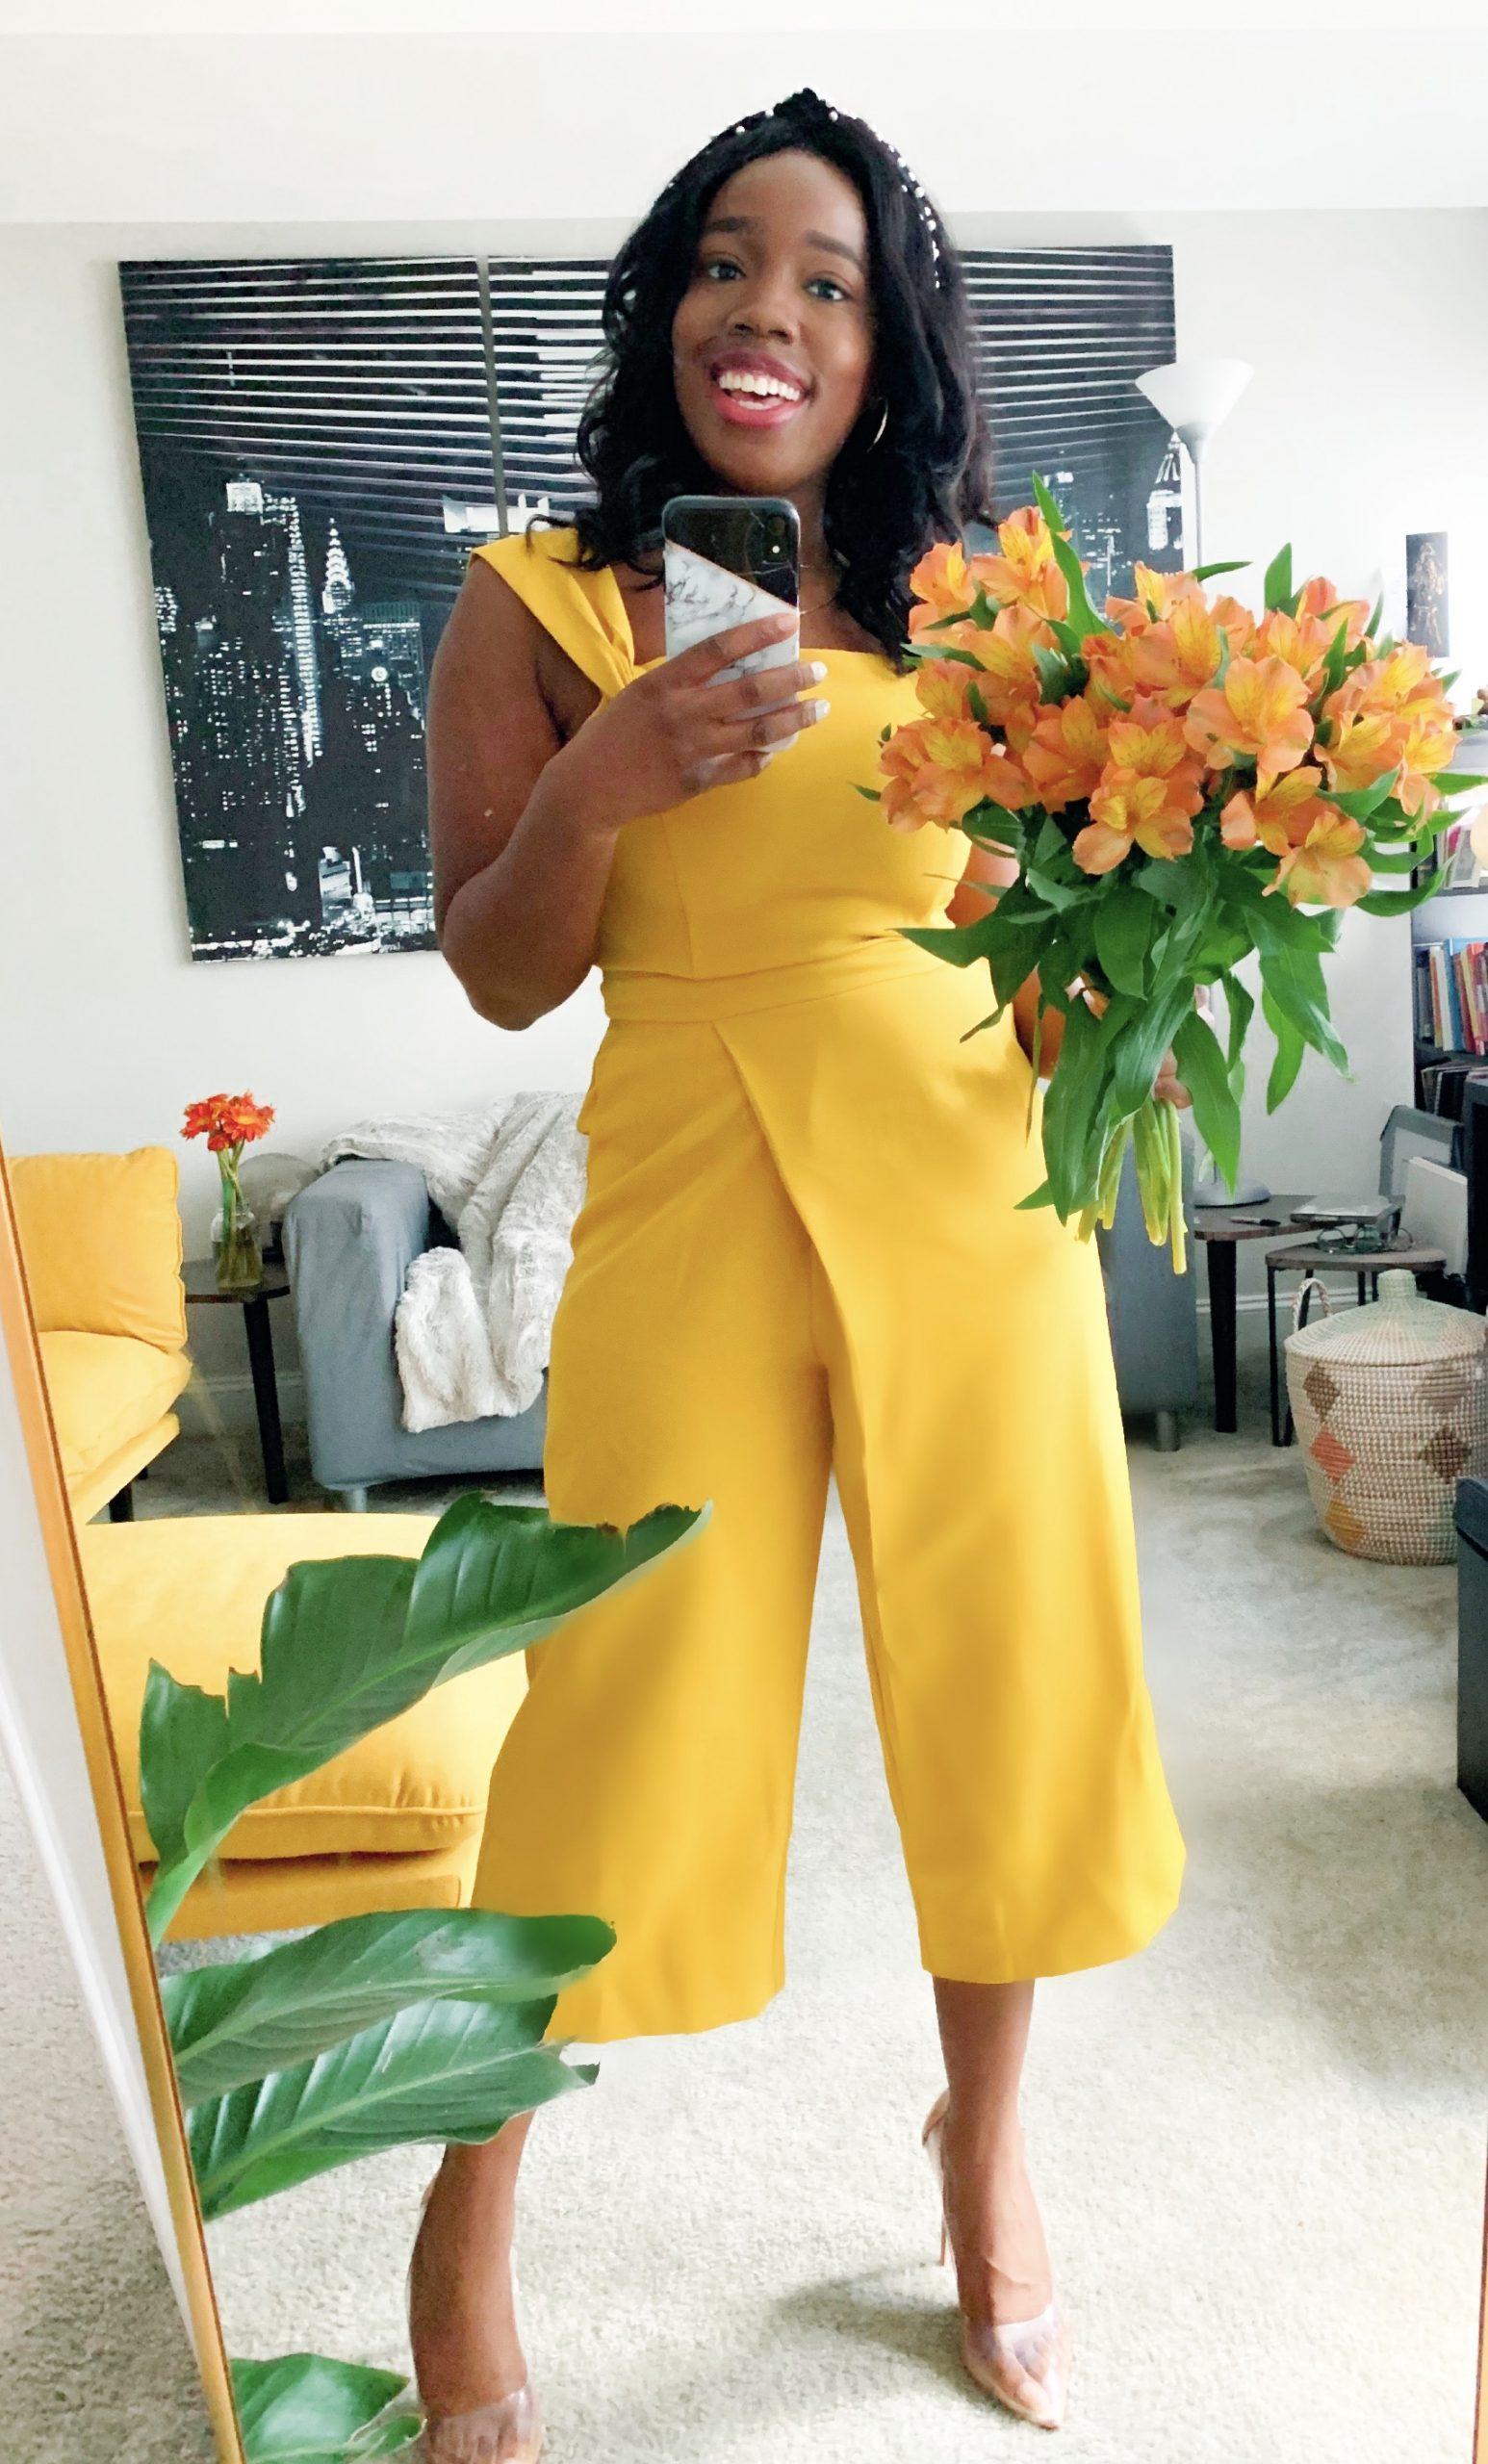 Fall Marigold Fashion Trend